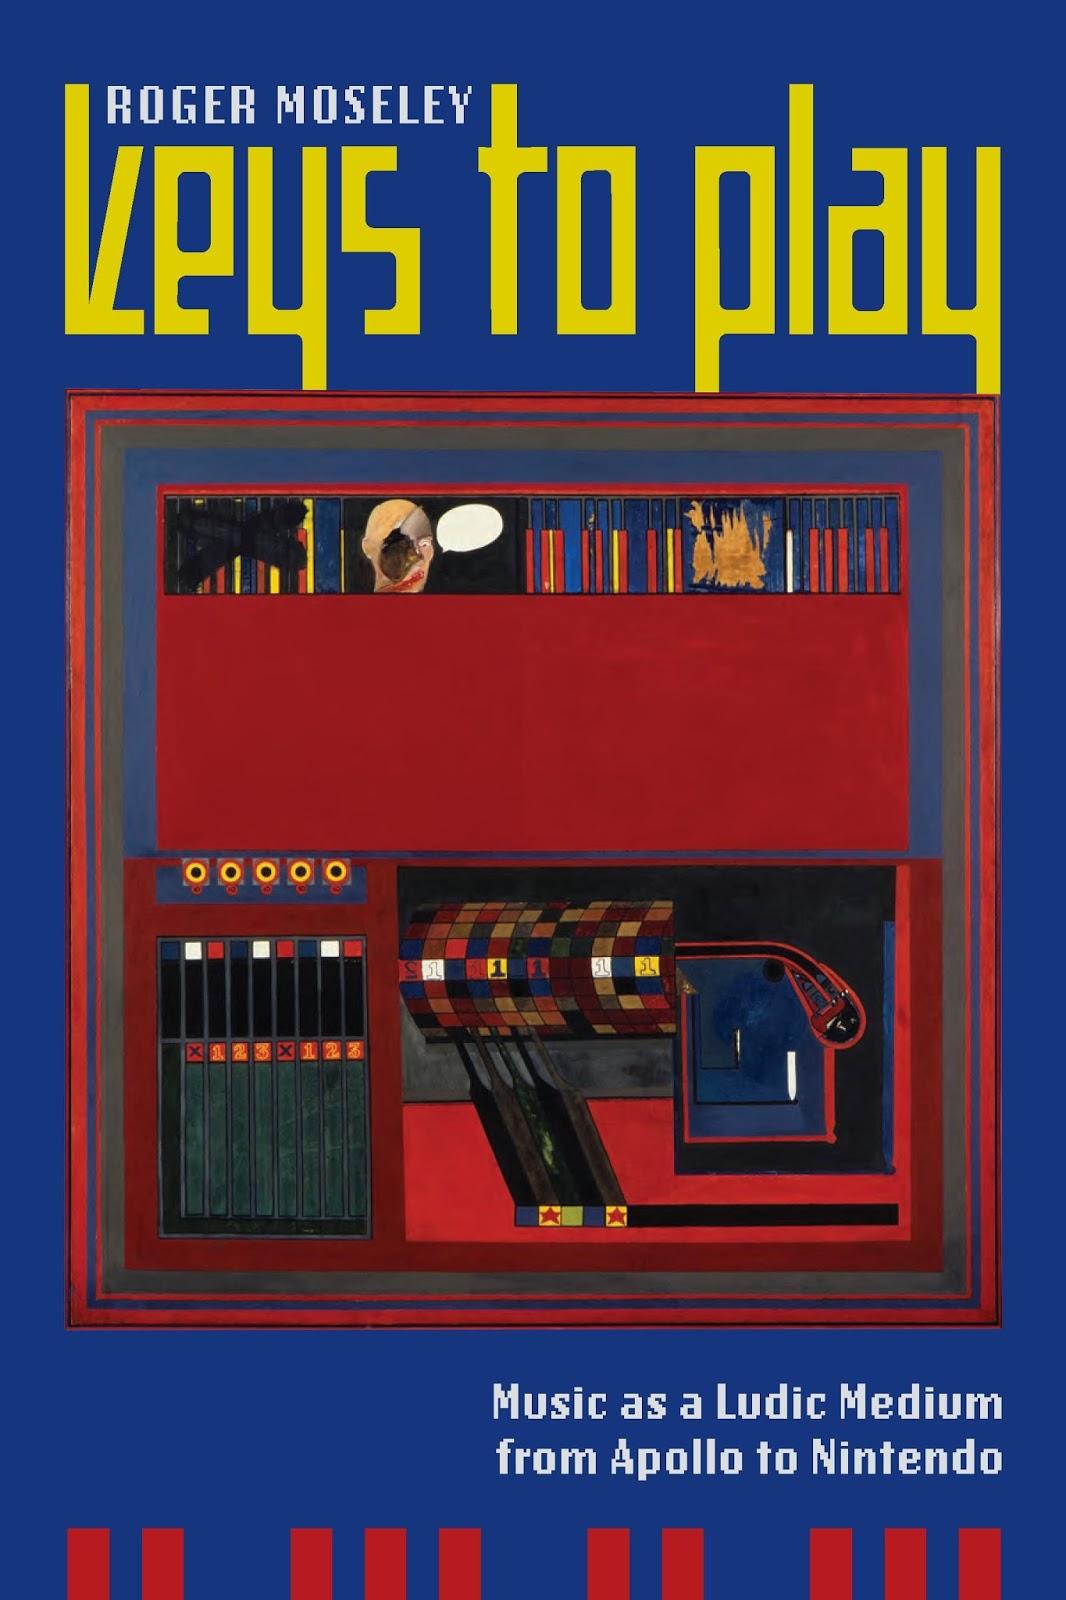 Keys to Play. Music as a Ludic Medium from Apollo to Nintendo